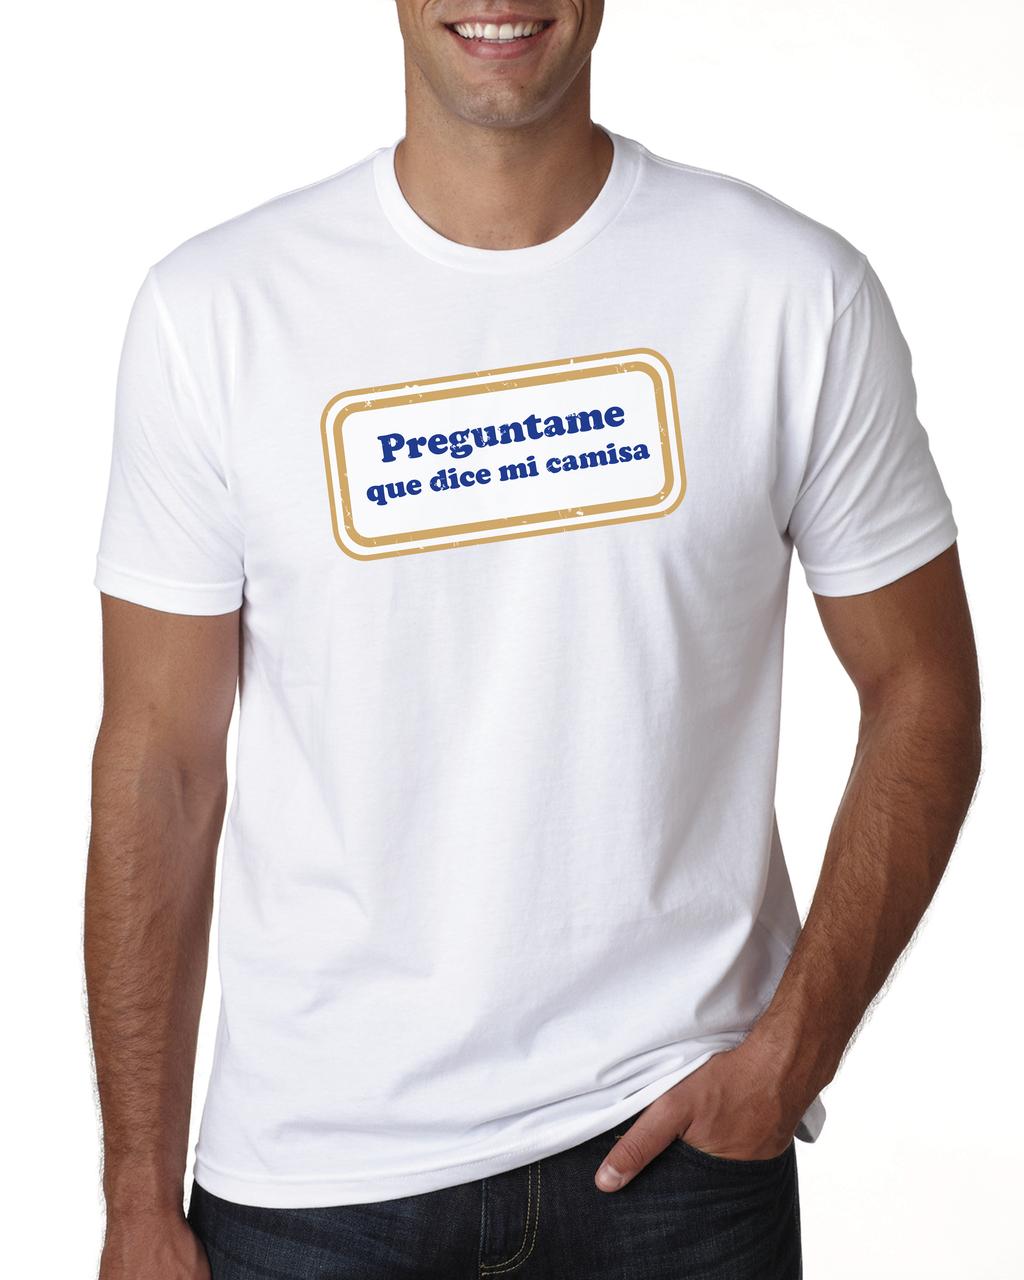 Preguntame que dice mi camisa